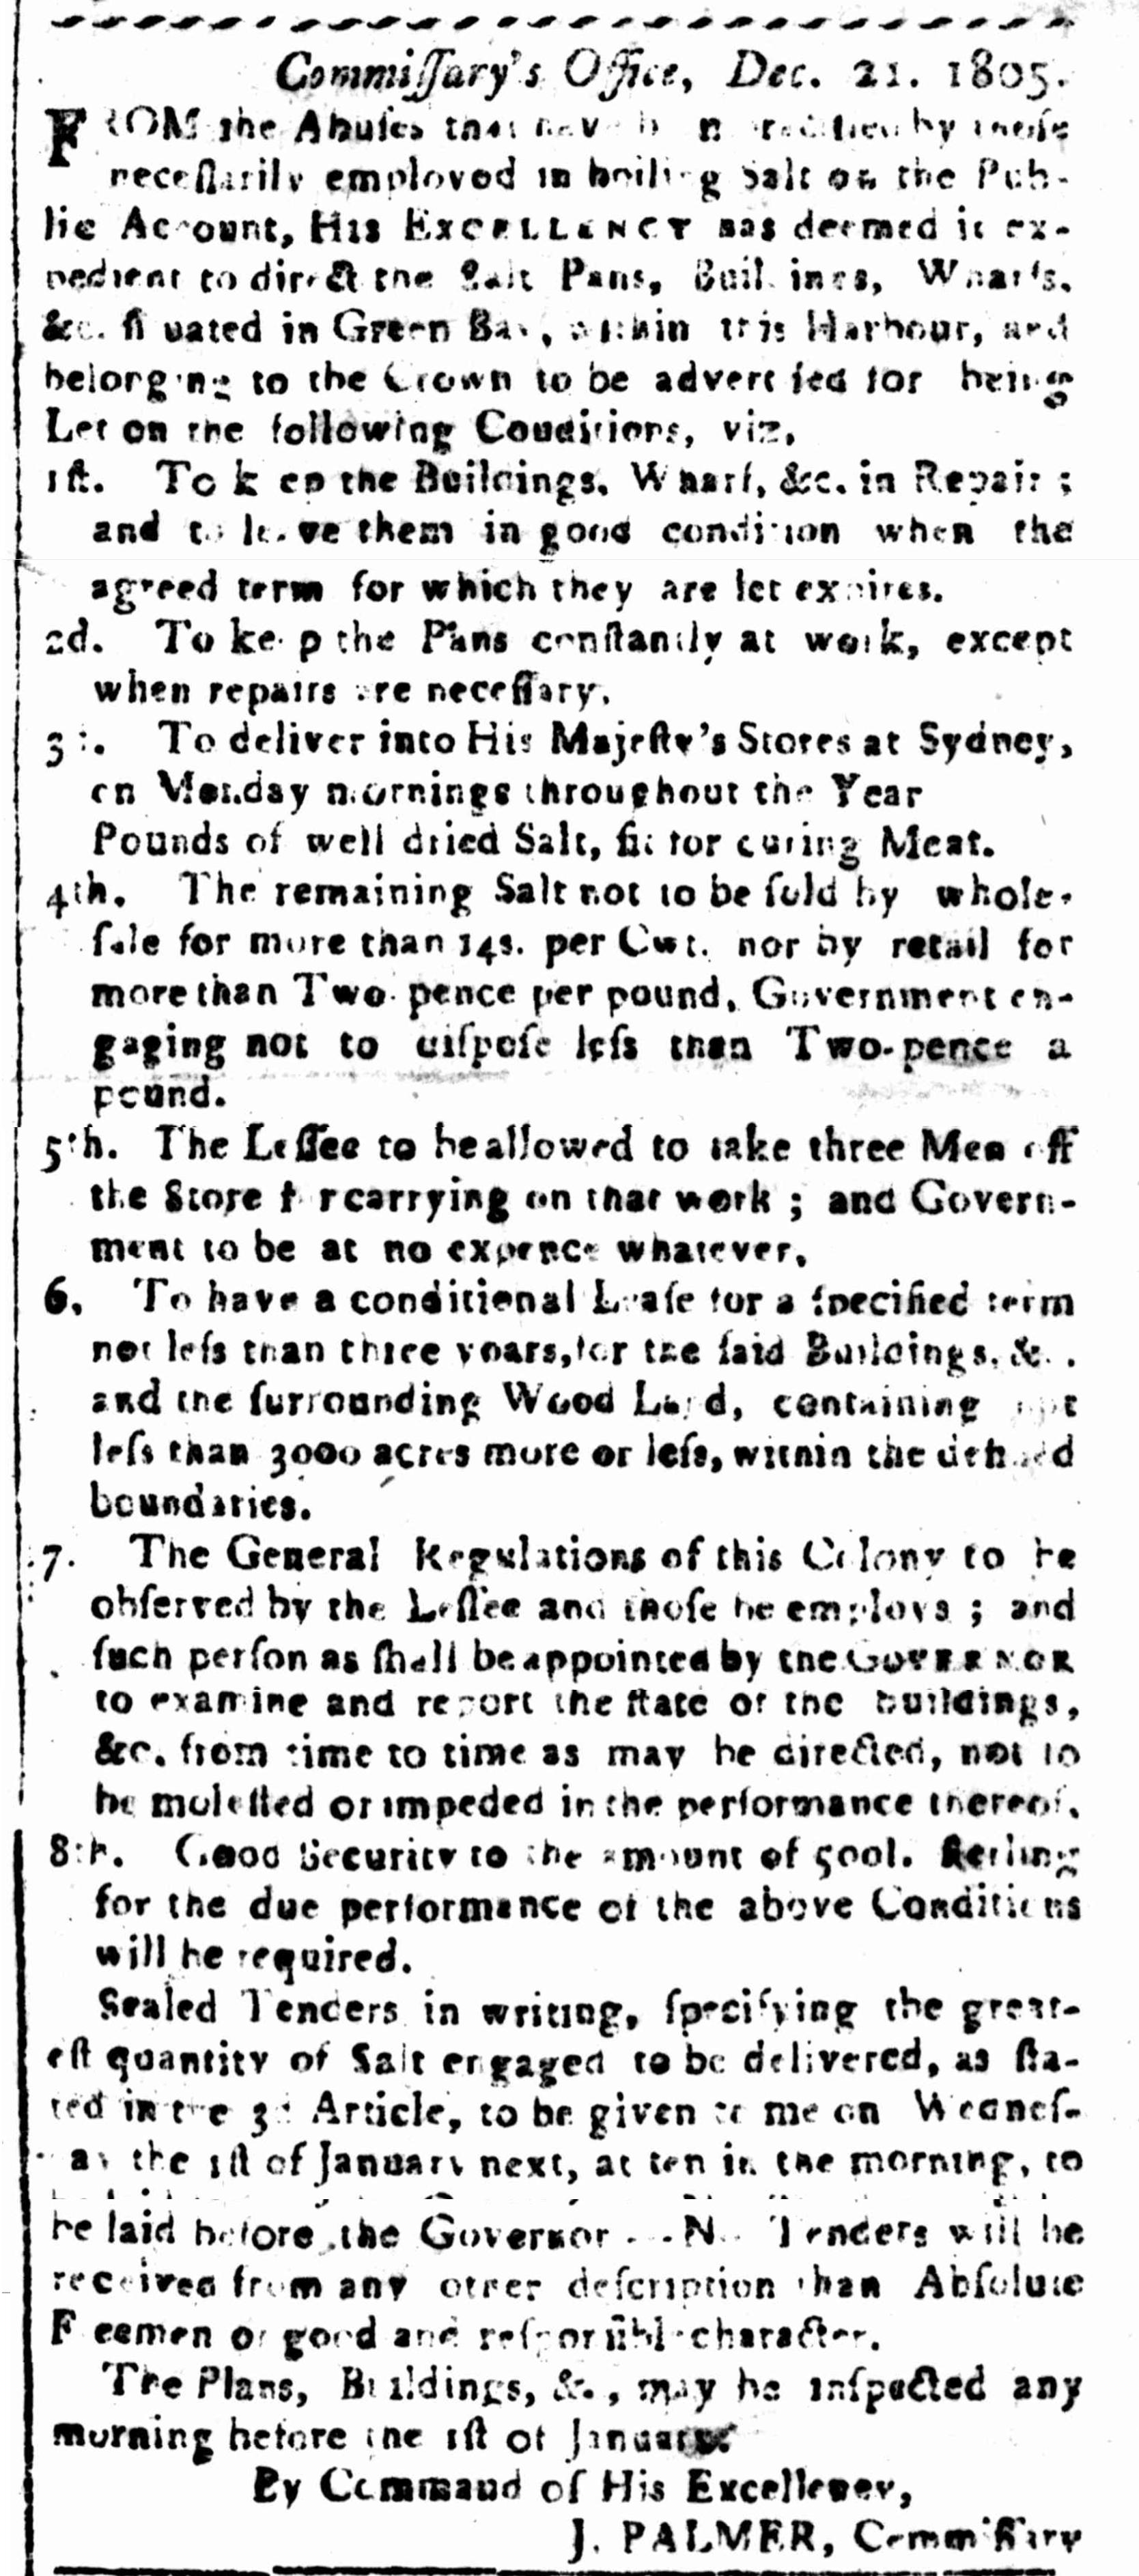 John Palmer, Advertisement, Commissary, 1800s, nineteenth-century, Sydney, New South Wales, Australian History, St. John's Cemetery Project, Old Parramattan, St. John's First Fleeters, First Fleet